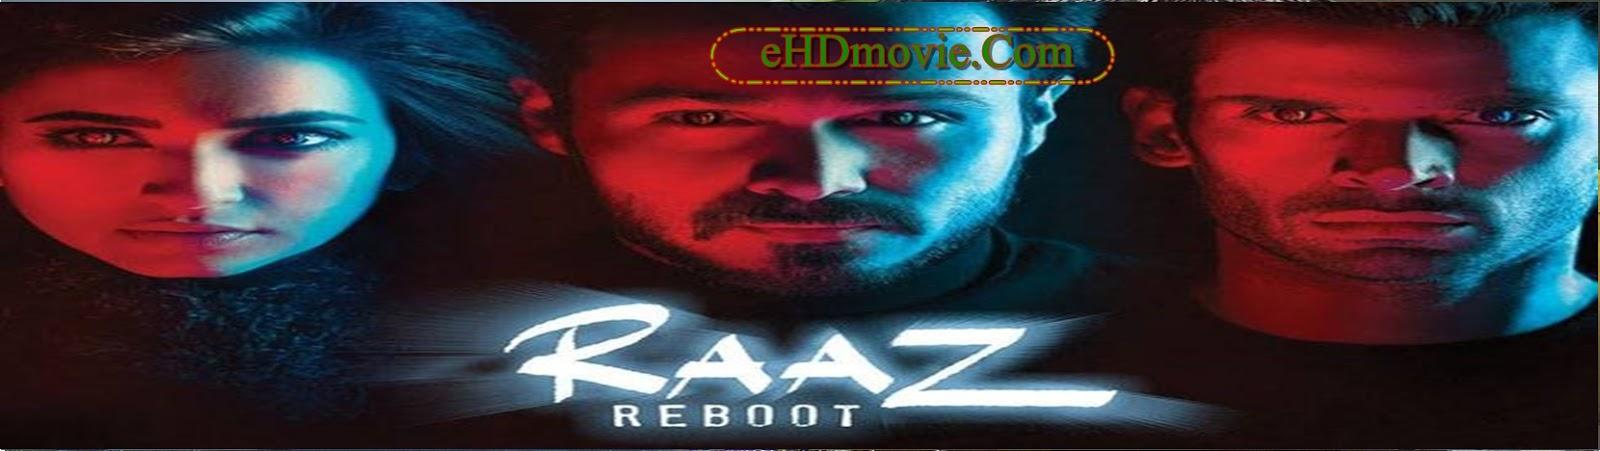 Raaz Reboot 2016 Full Movie Hindi 720p - 480p ORG BRRip 350MB - 1GB ESubs Free Download